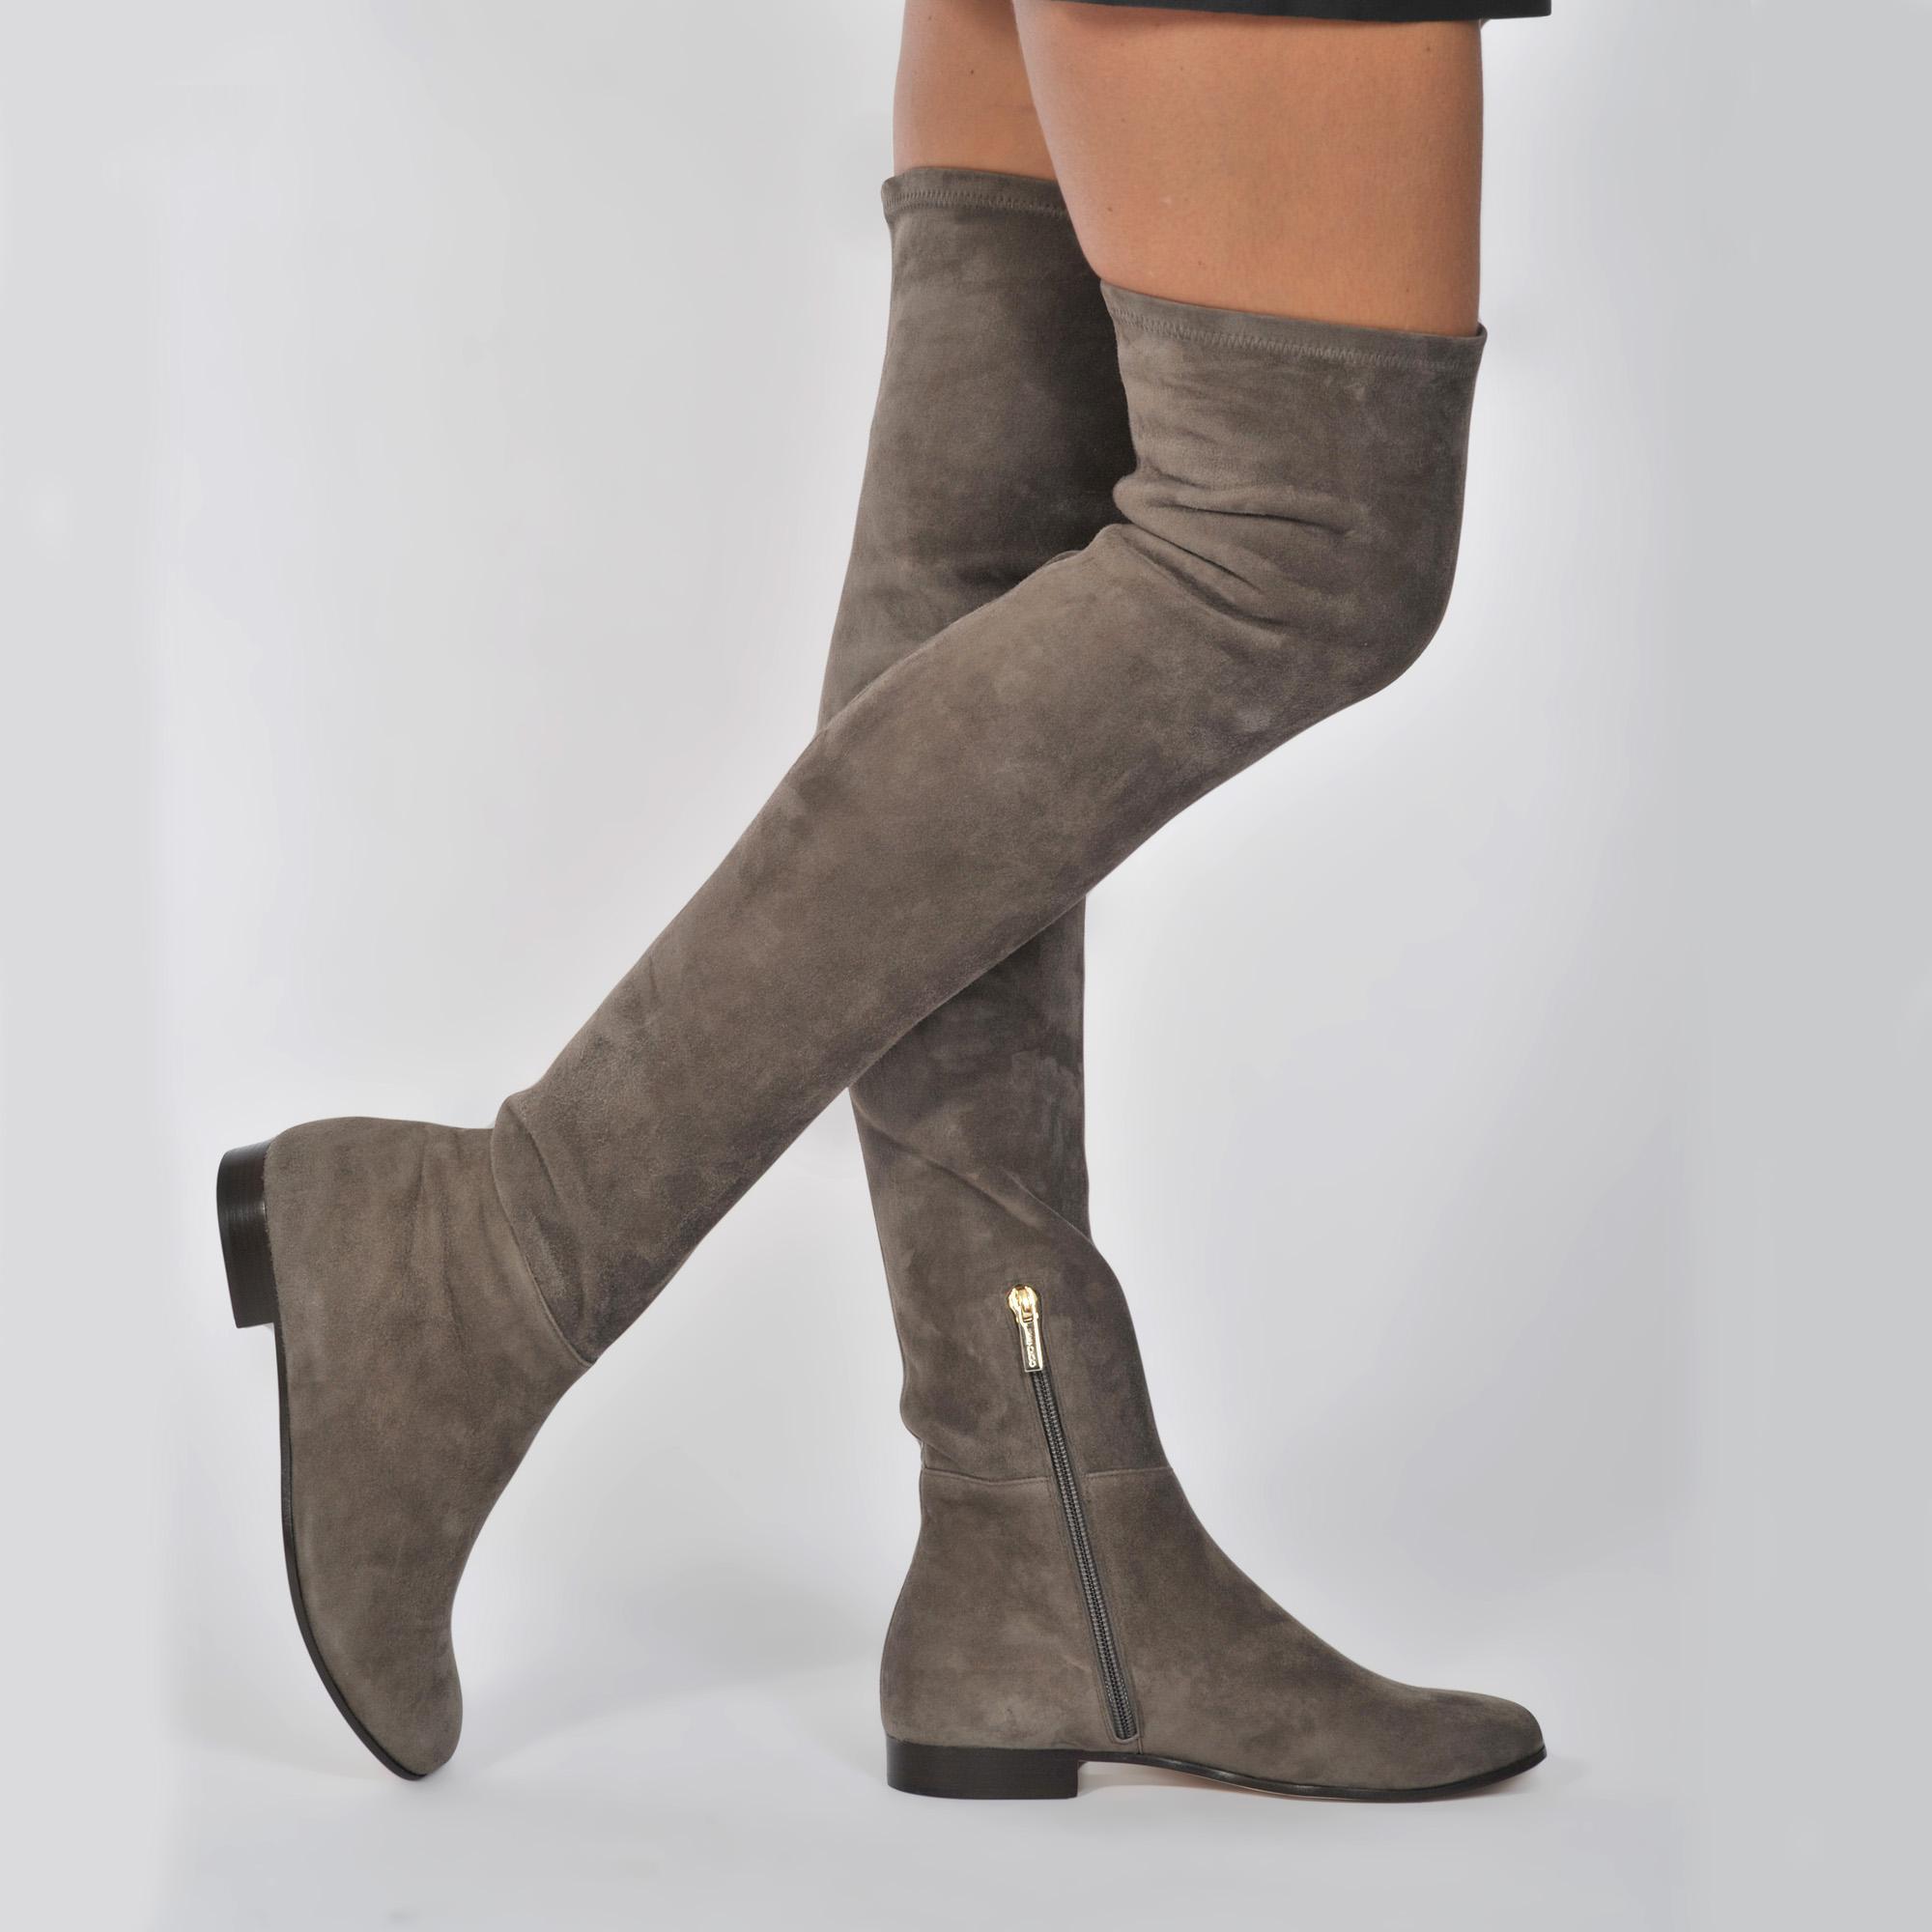 Store For Sale Myren long stretch boots Jimmy Choo London Cheap Sale Release Dates Discount Best Sale Wjy4F4mDuF